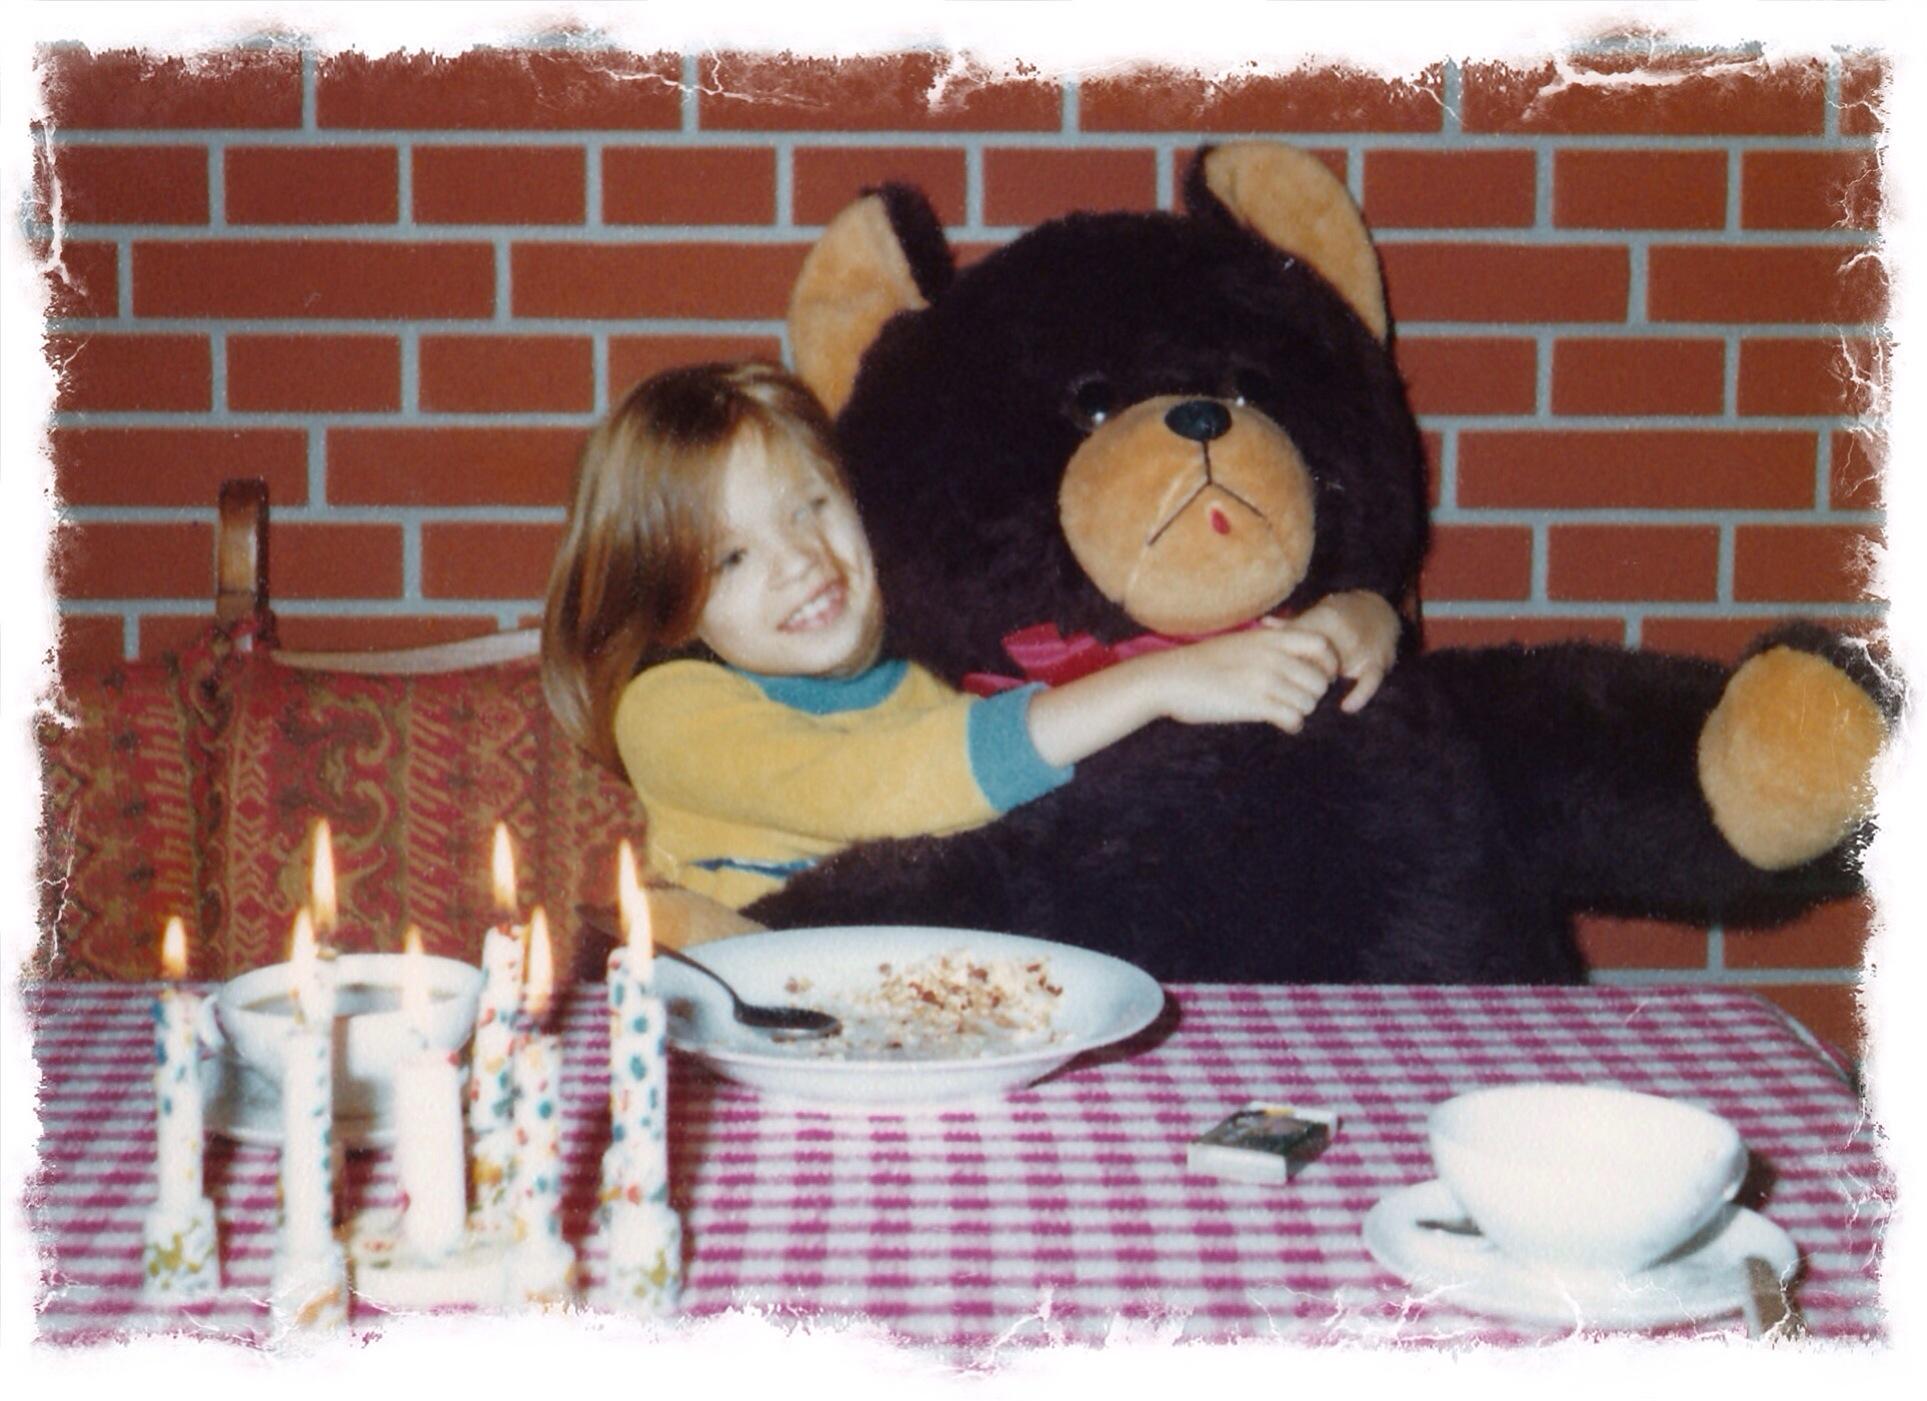 Brummbär zum Geburtstag